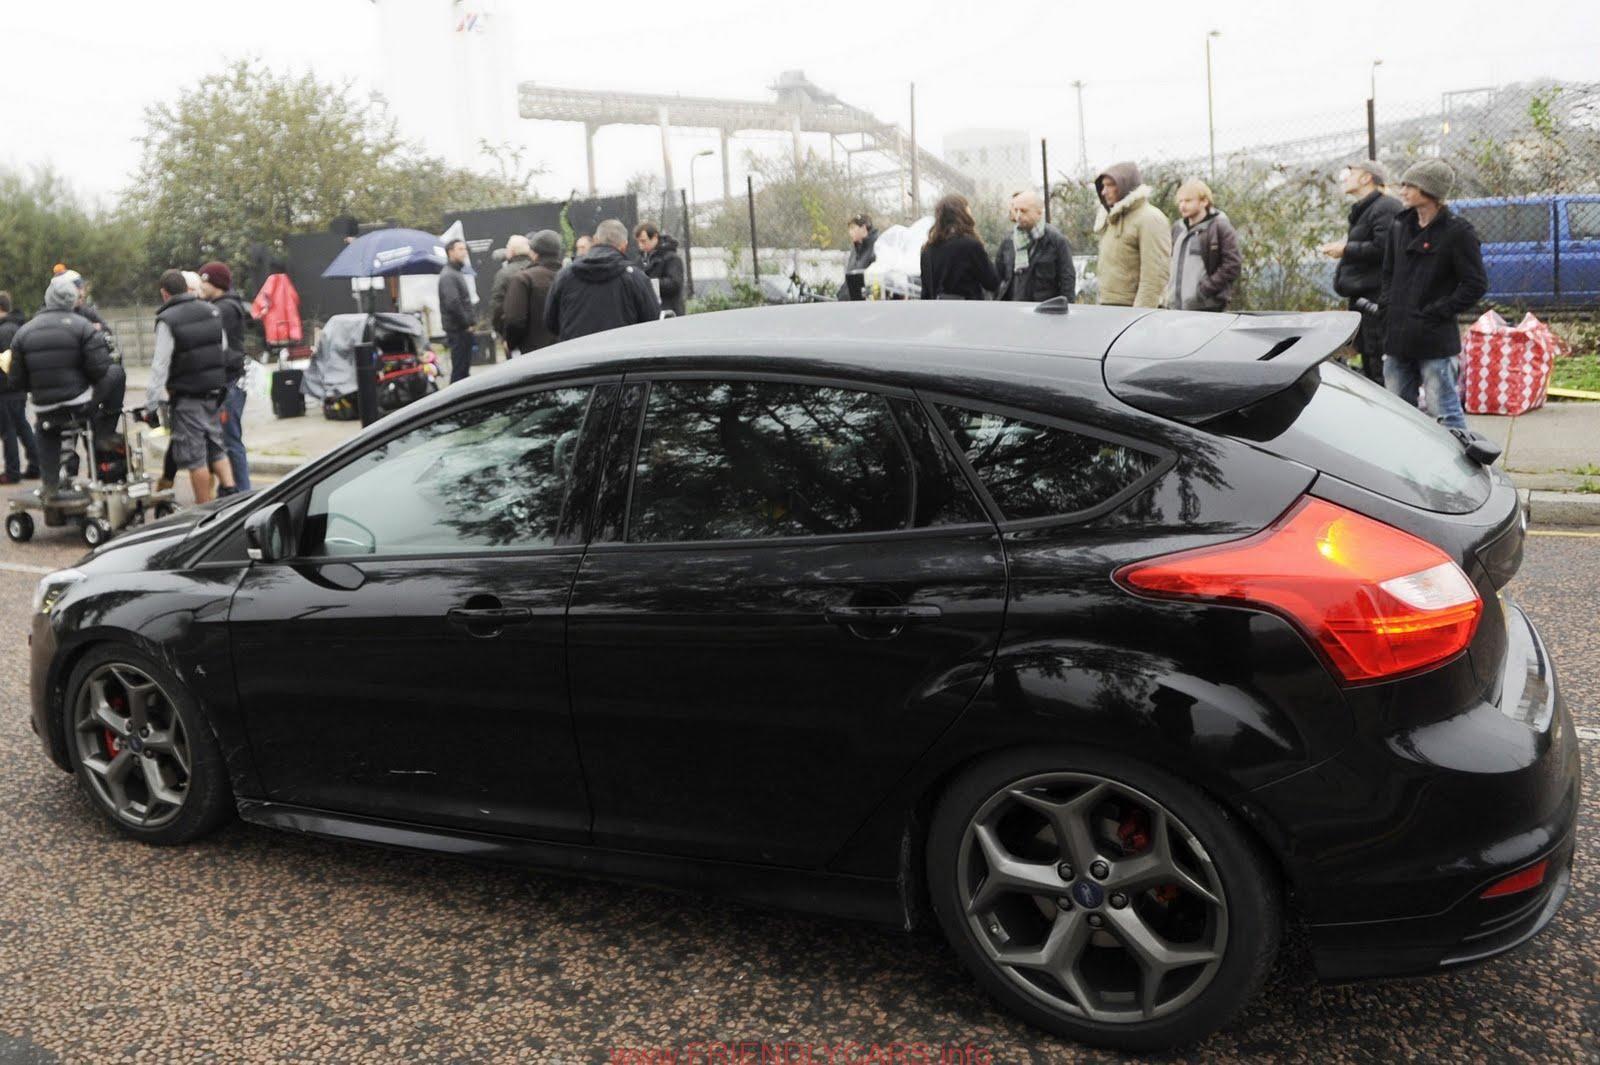 2012 Ford Focus St Black Car Images Hd Alifiah Sites Autos Y Motos Autos Motos